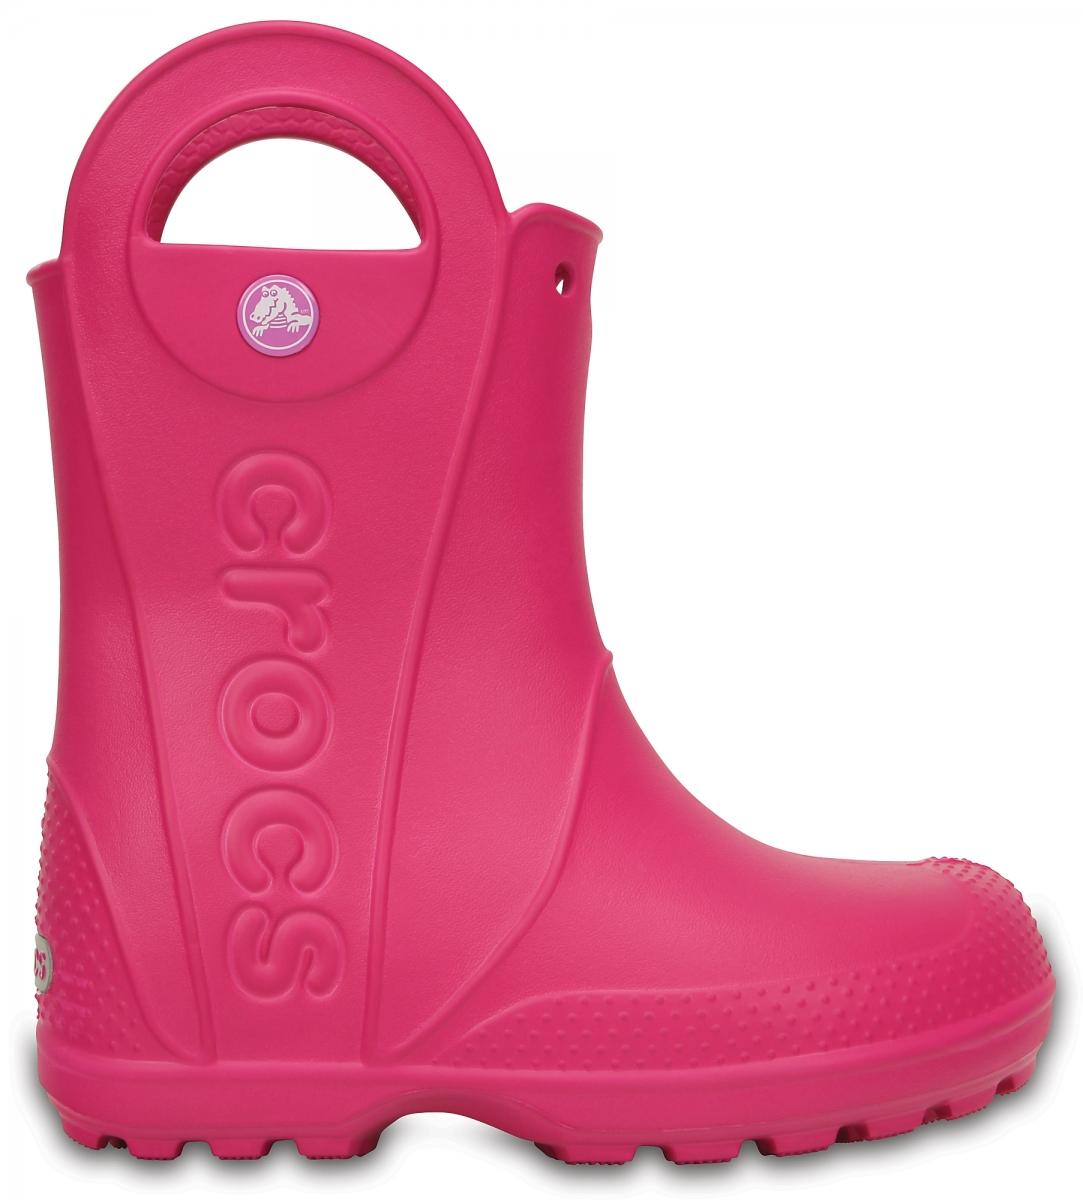 Crocs Handle It Rain Boot Kids - Candy Pink, J1 (32-33)